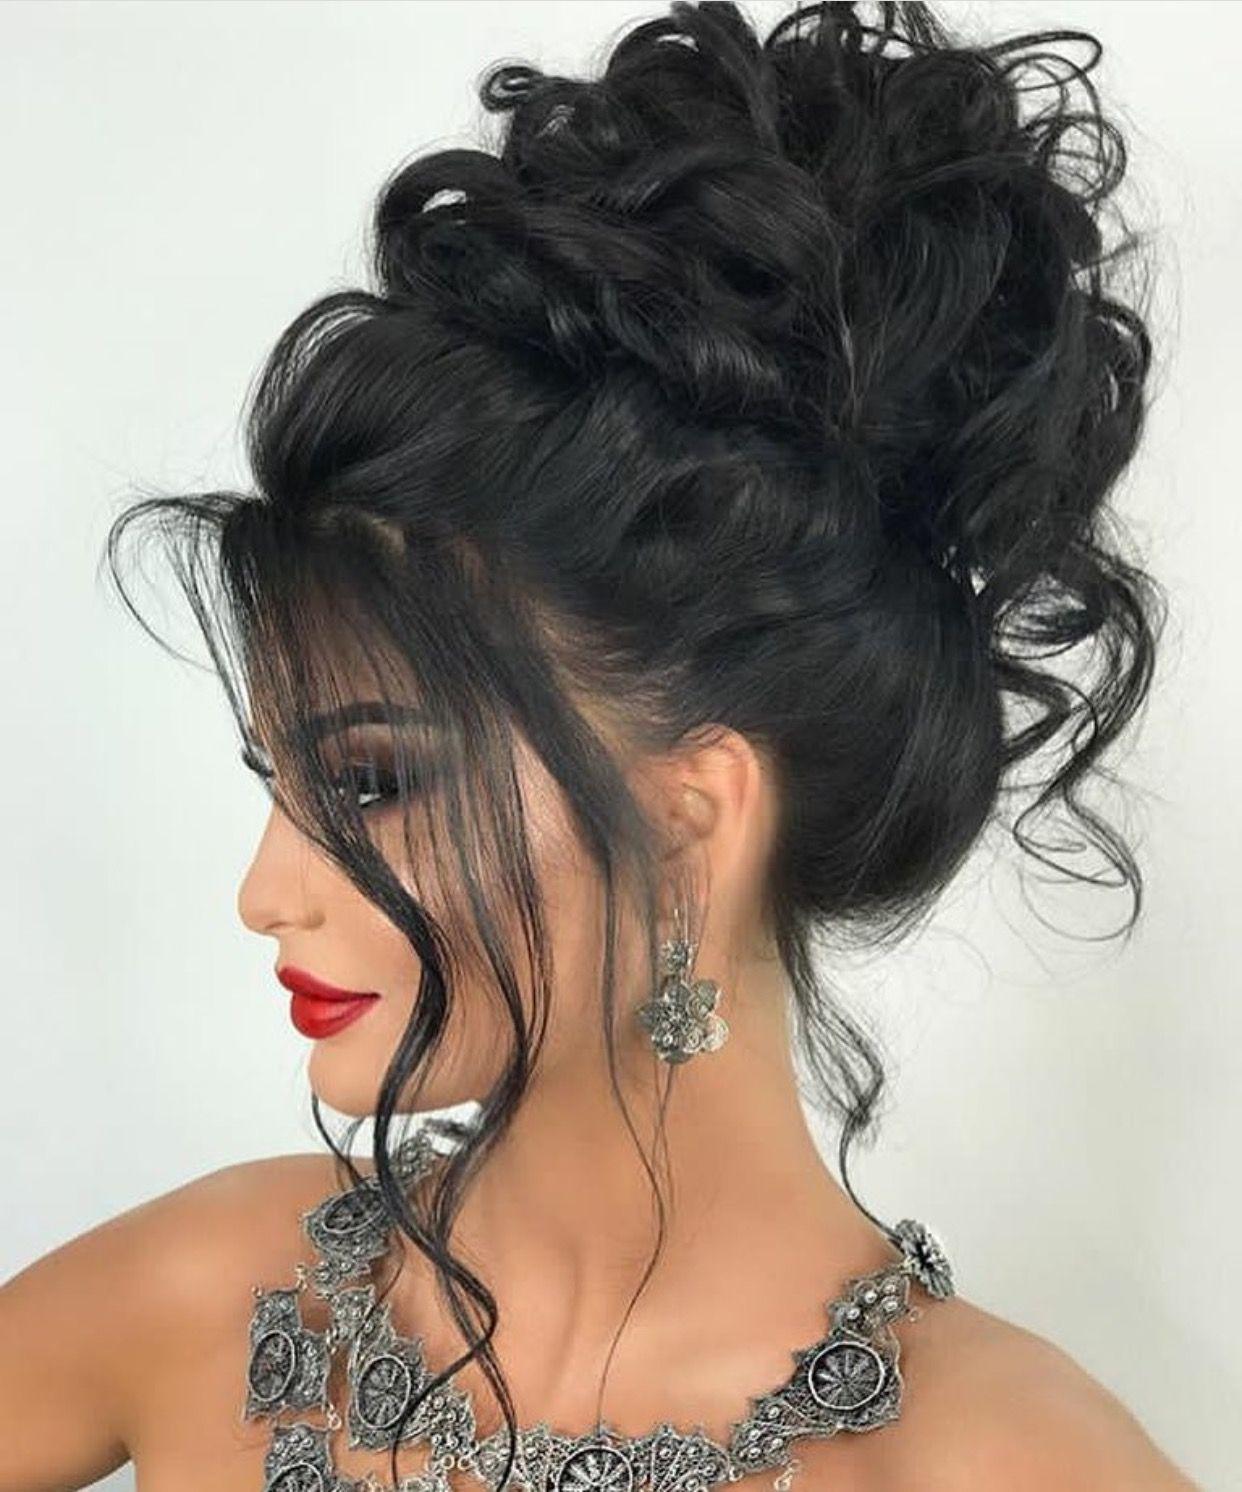 Pin by jenny on fabulous updo in pinterest hair styles